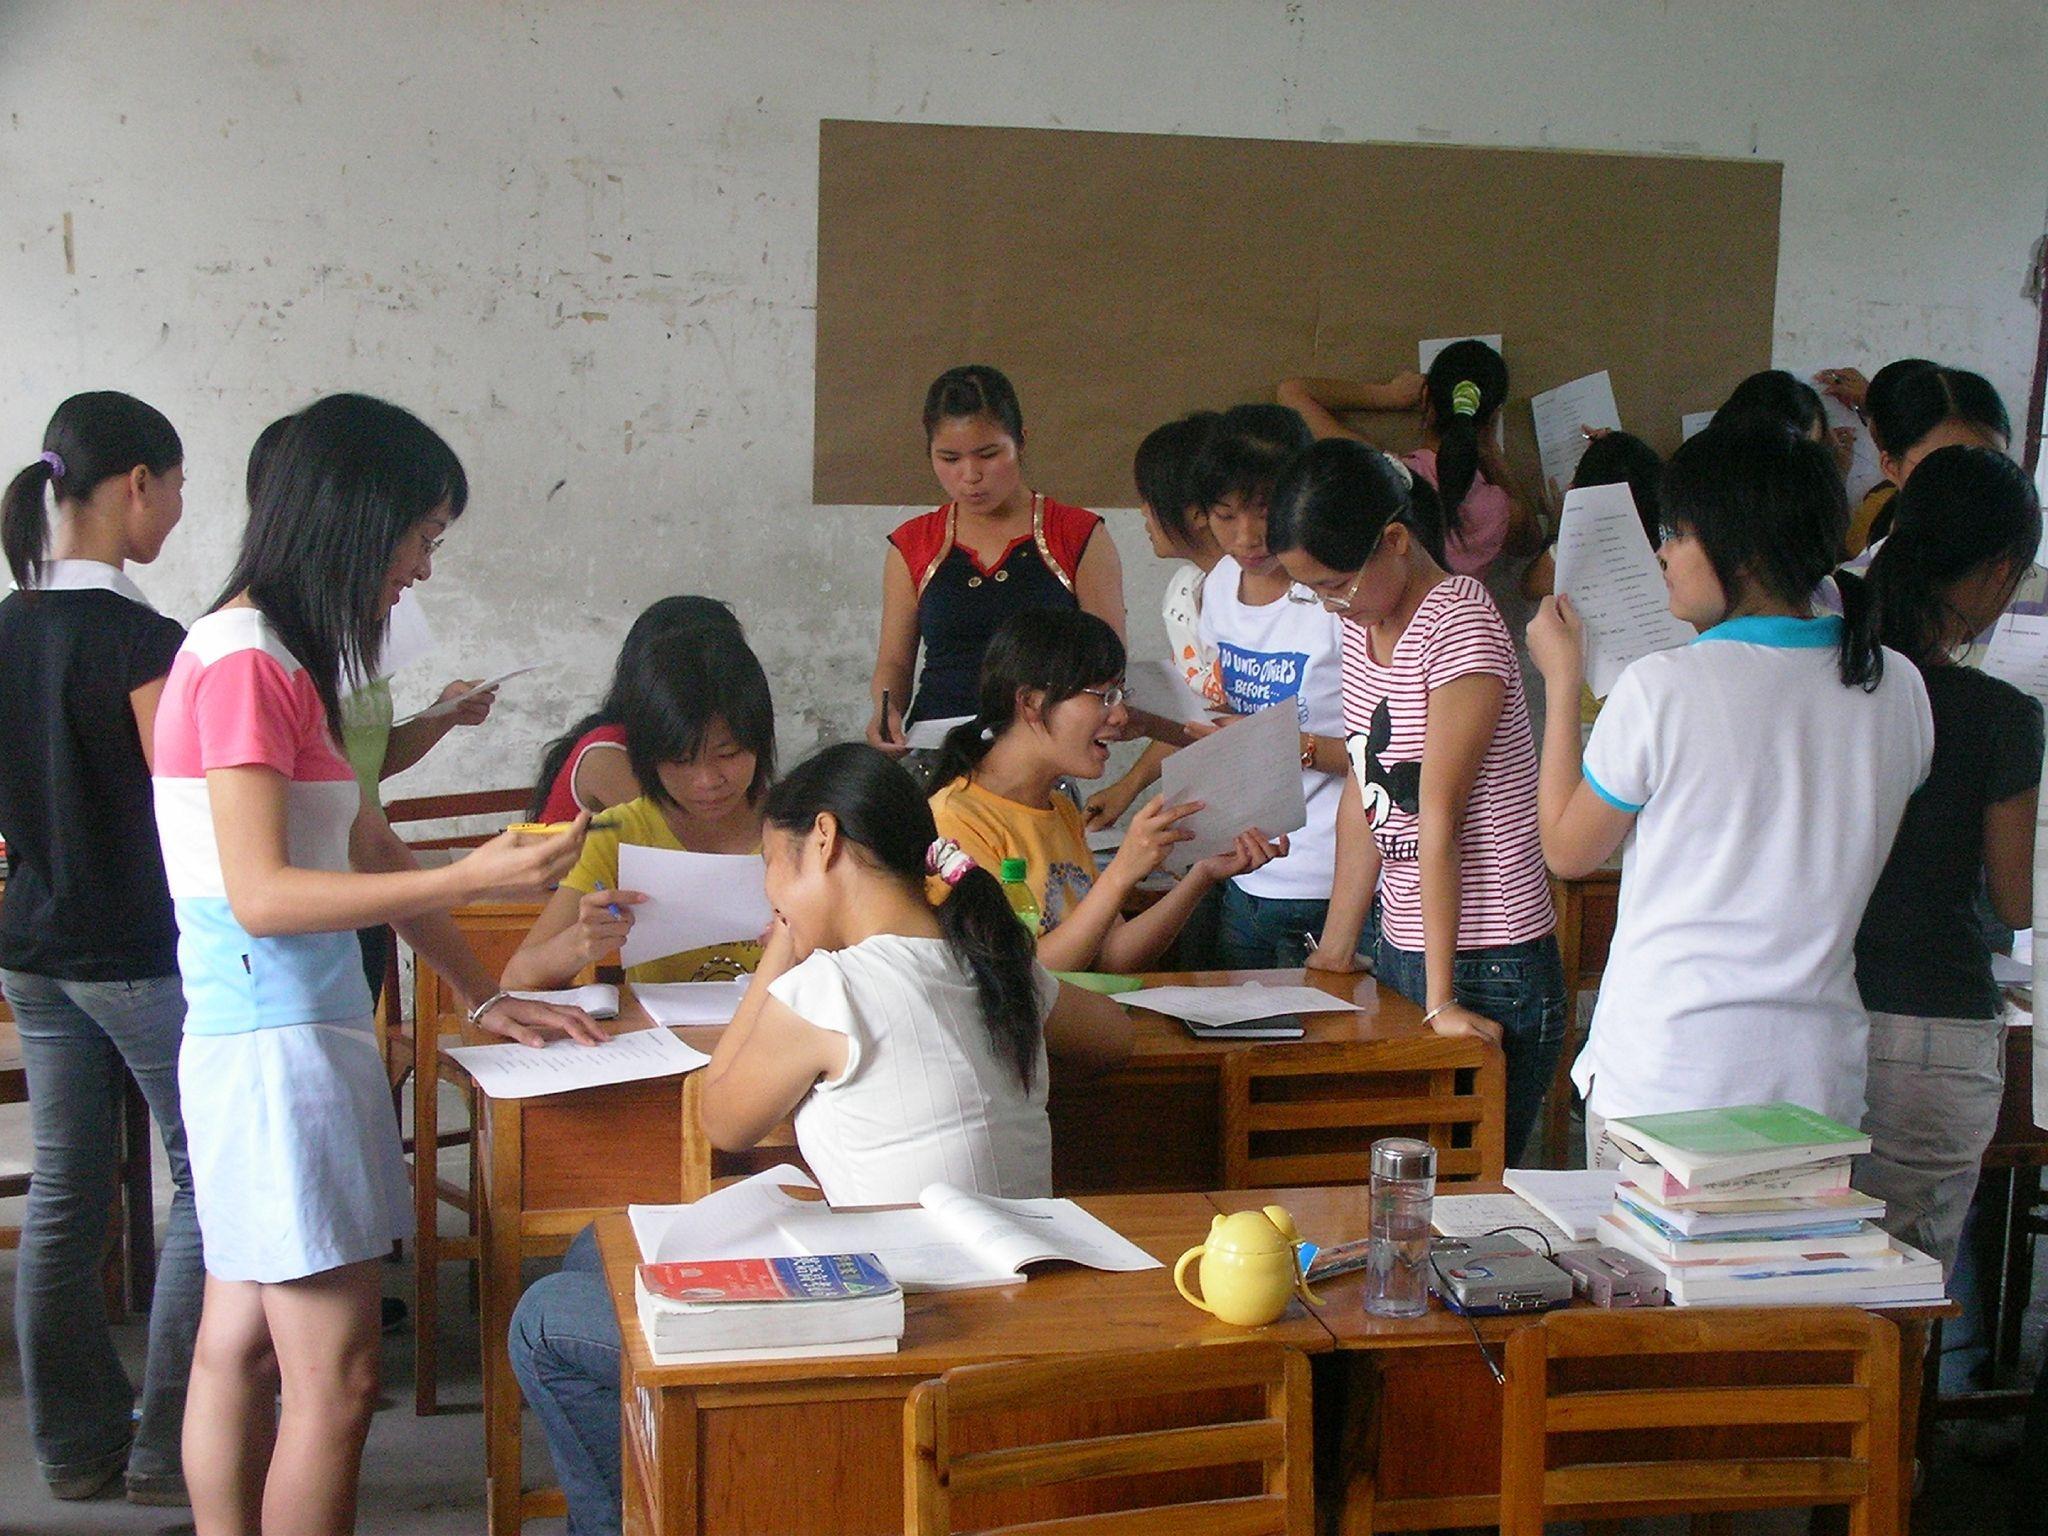 sala de aula invertida - Ensino Híbrido